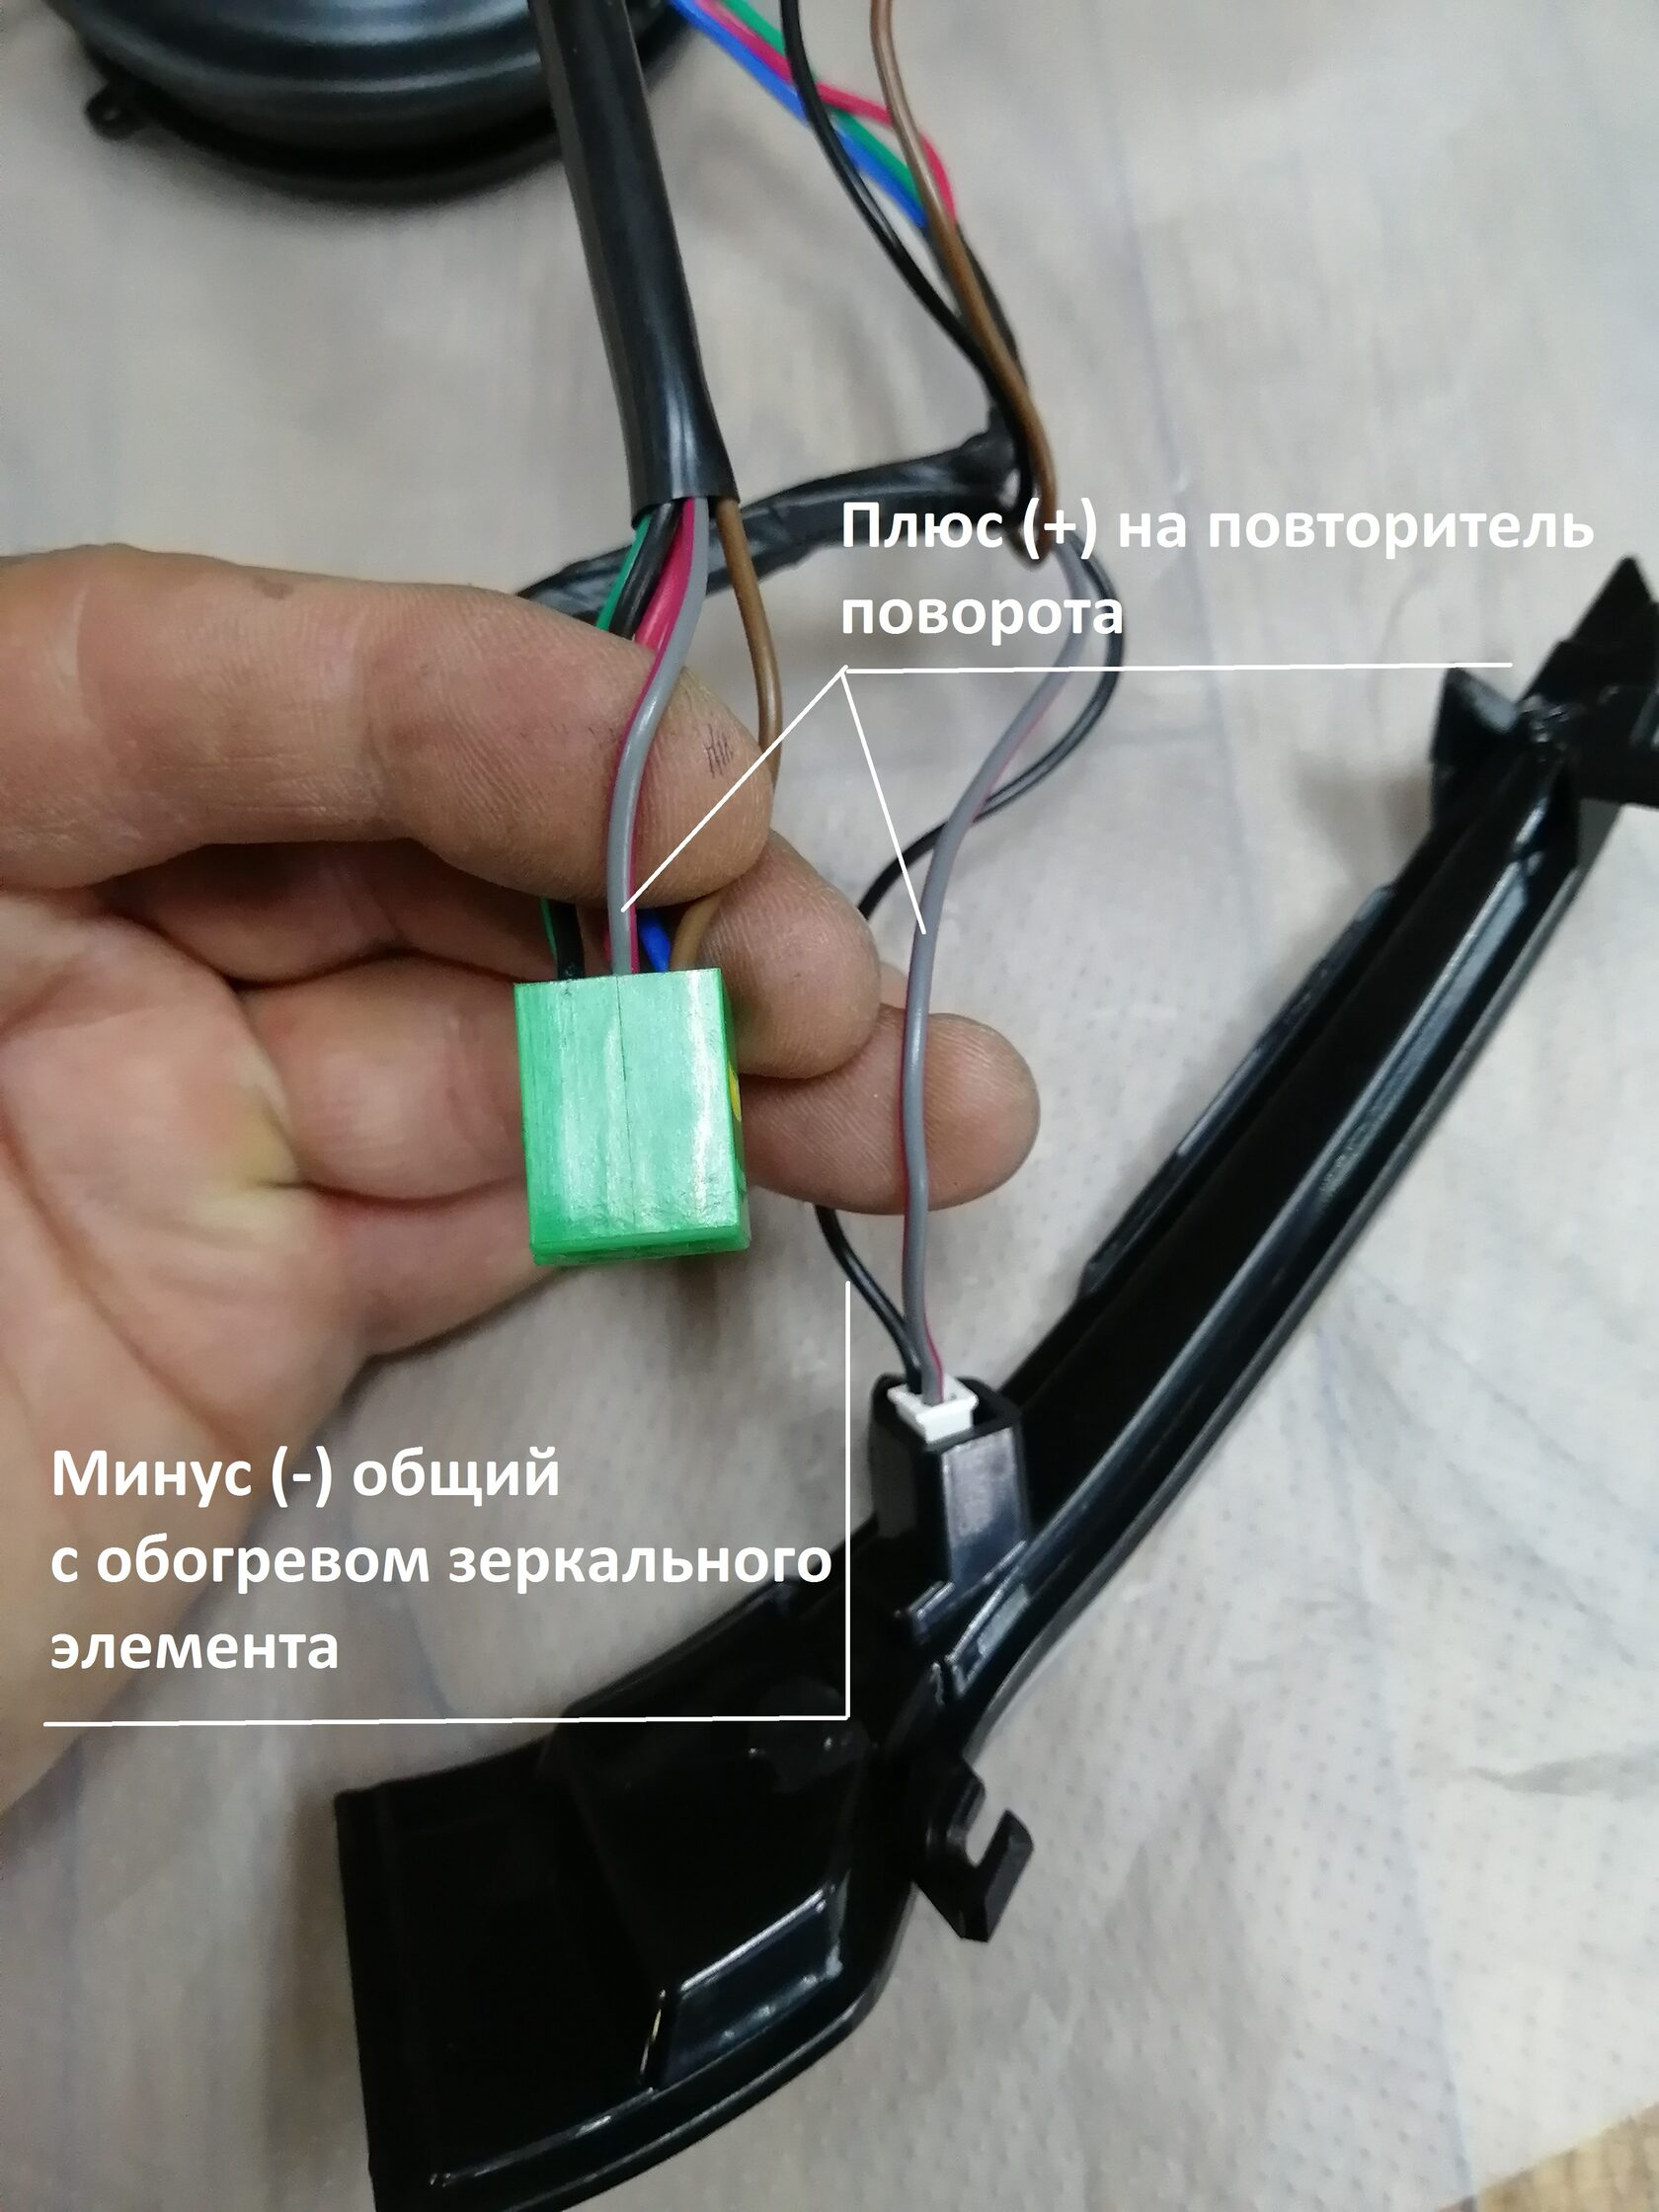 Распиновка разъема бокового электрического зеркала 2190 Гранта, Датсун.